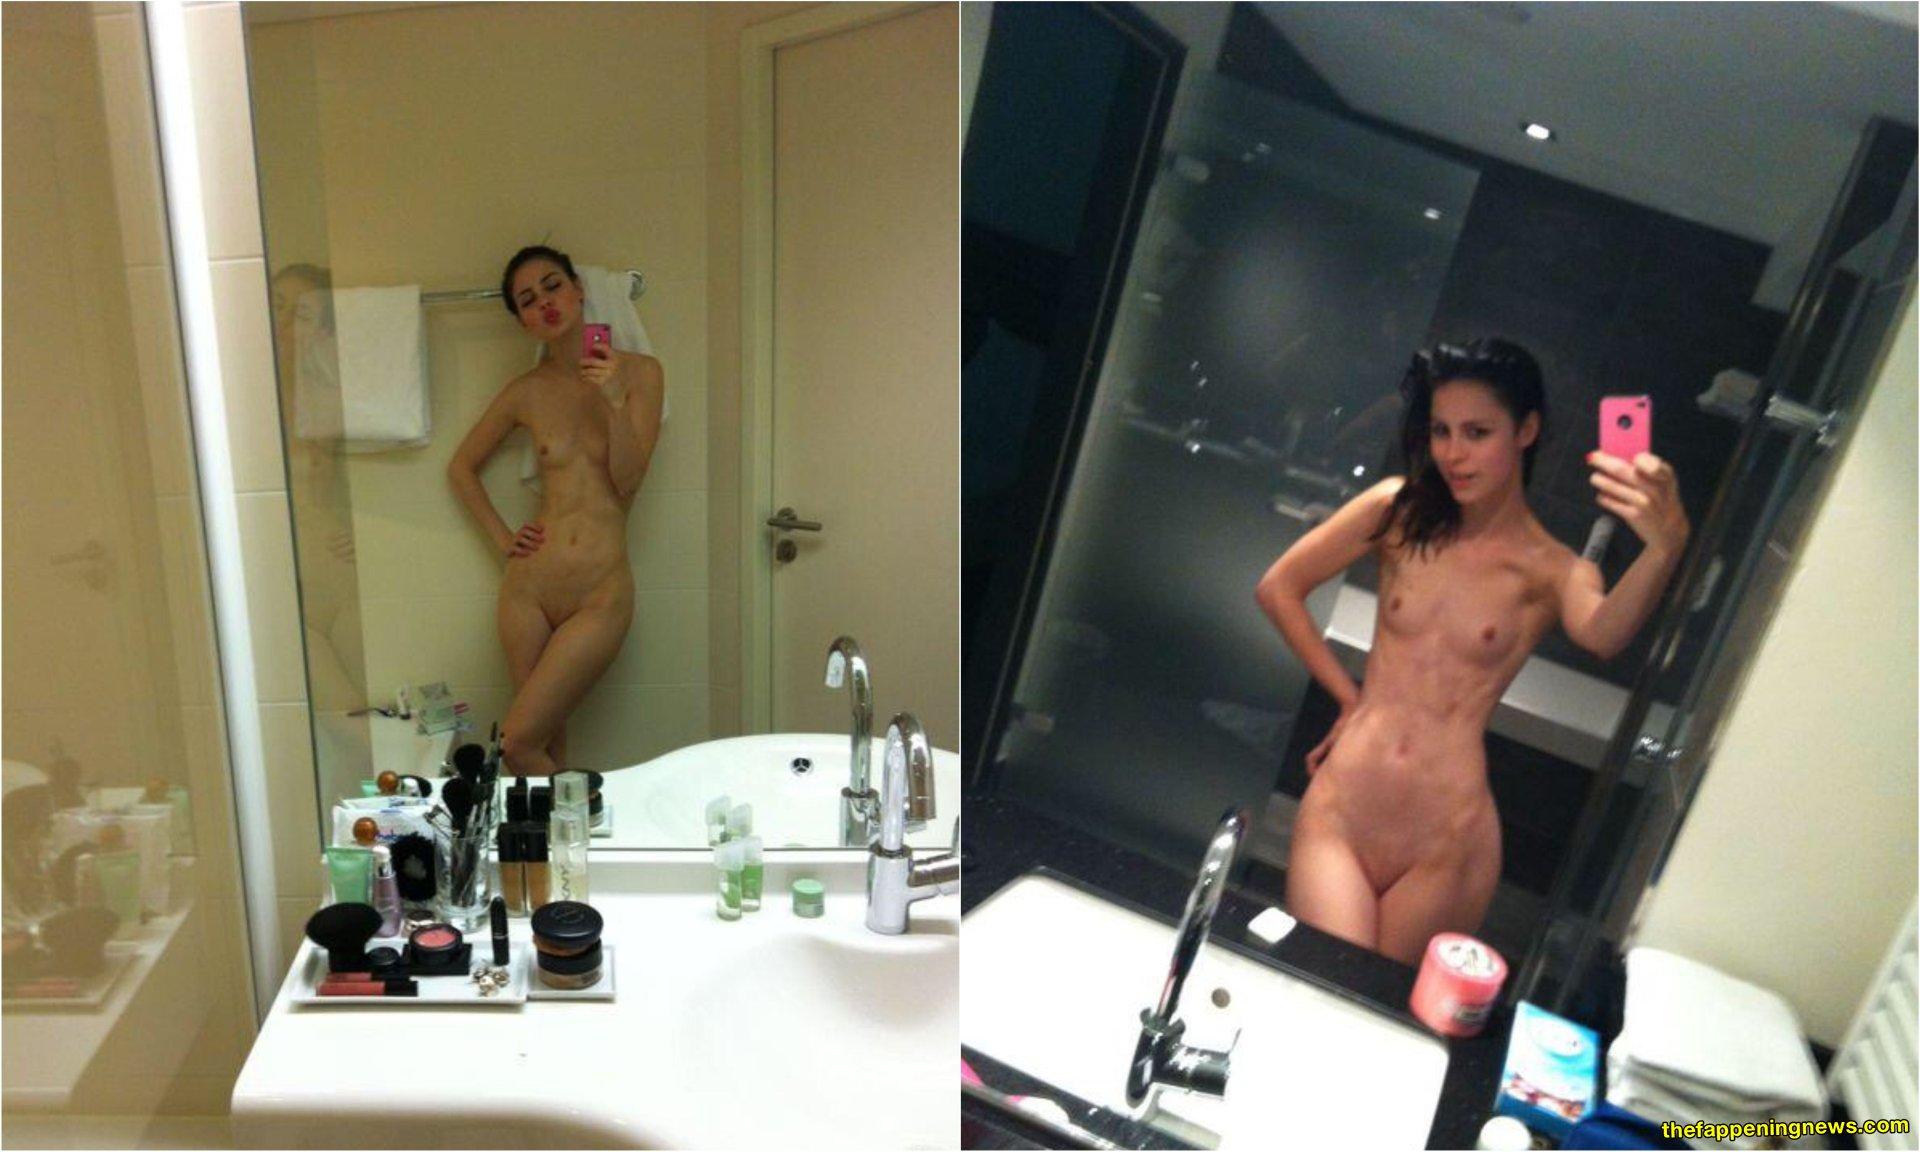 Nude lena leaked meyer landrut German singer